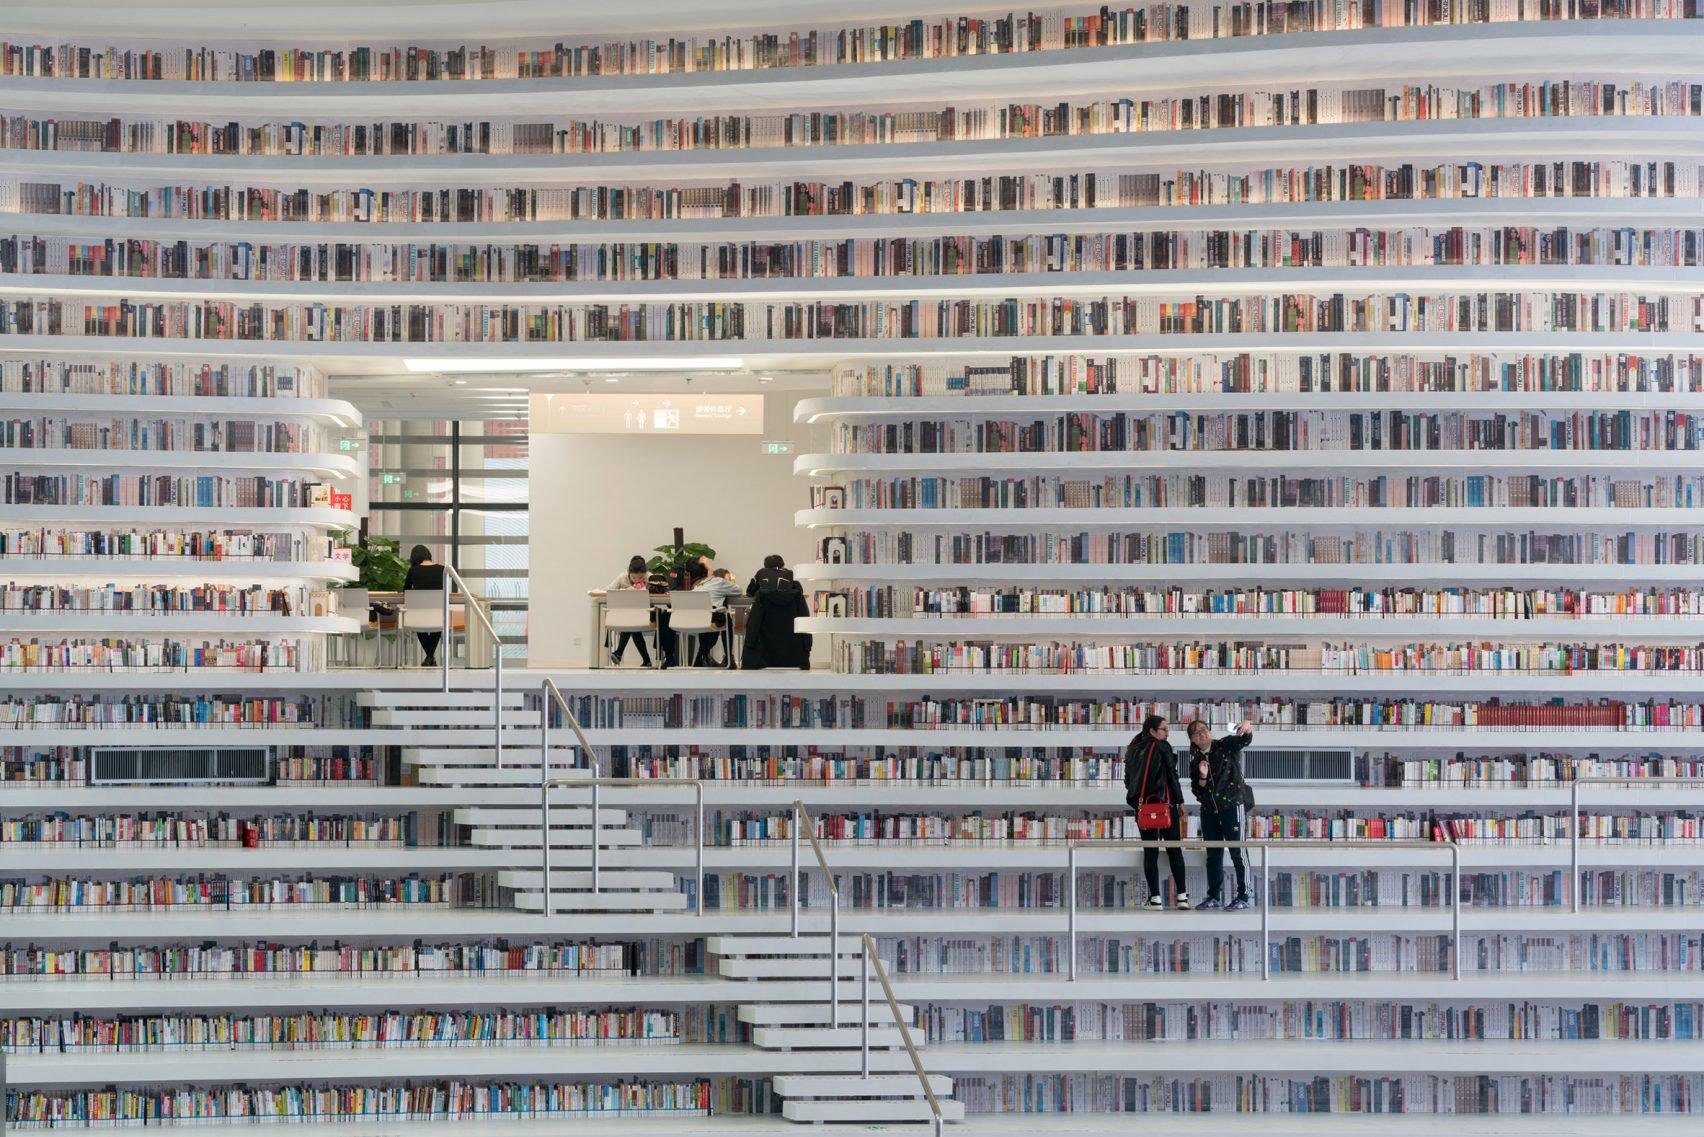 biblioteca publica tianjin